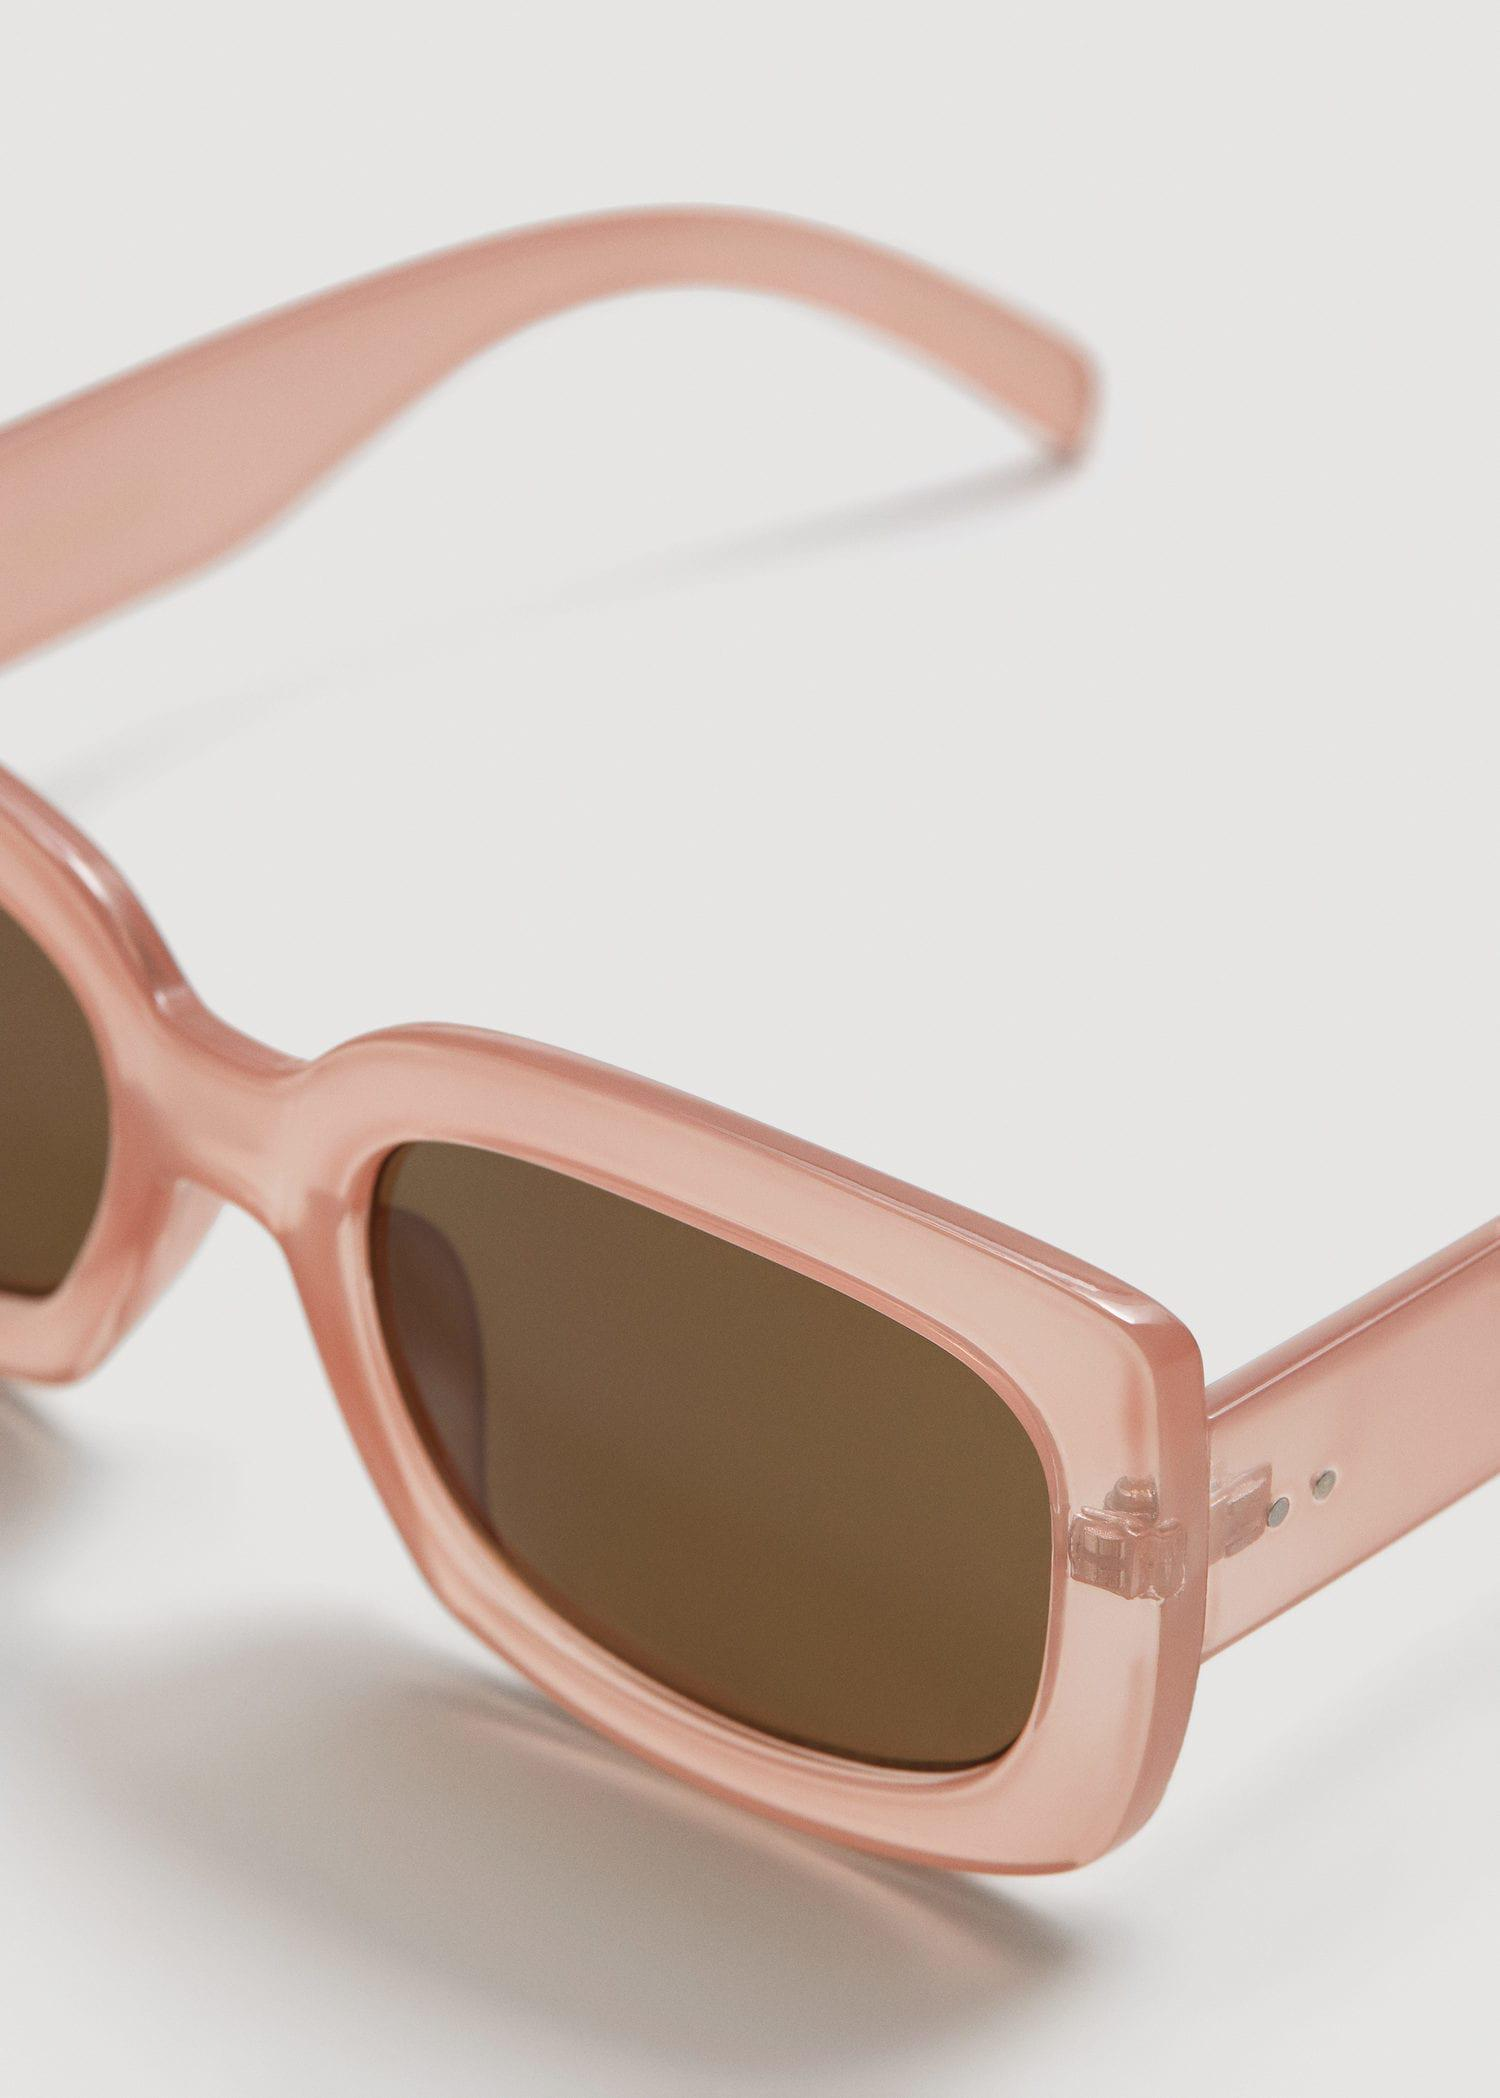 Mango Sunglasses in Pink